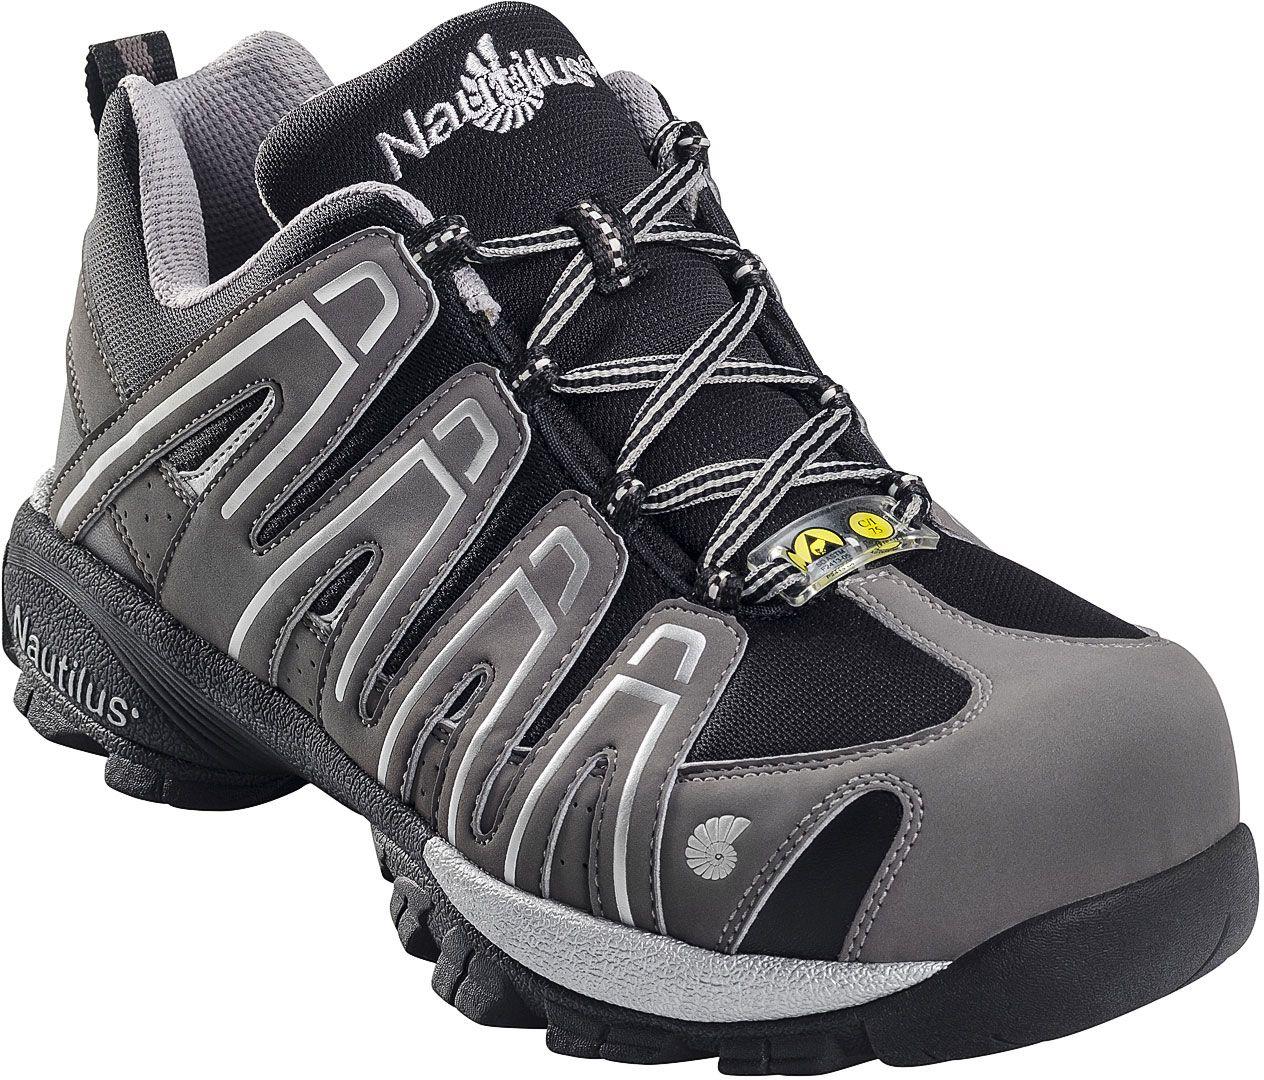 a995eca4ba518e Converse safety shoes sale up to discounts jpg 1264x1080 Converse safety  shoes